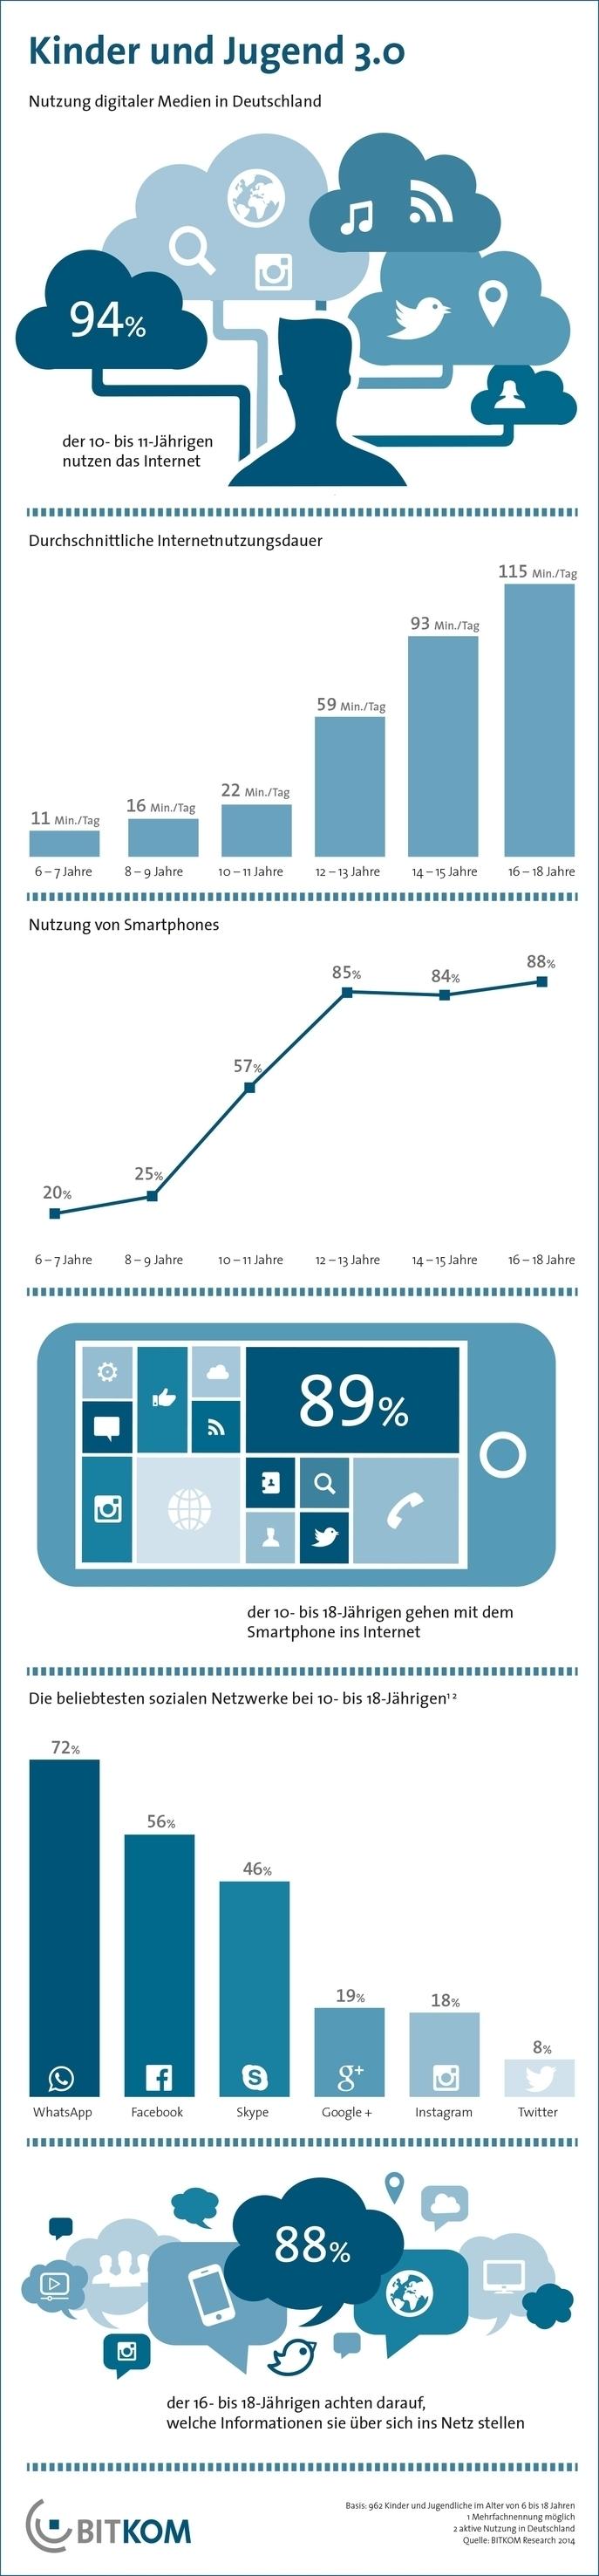 Post und Telekommunikation, Telekommunikation April bis Juni 2014